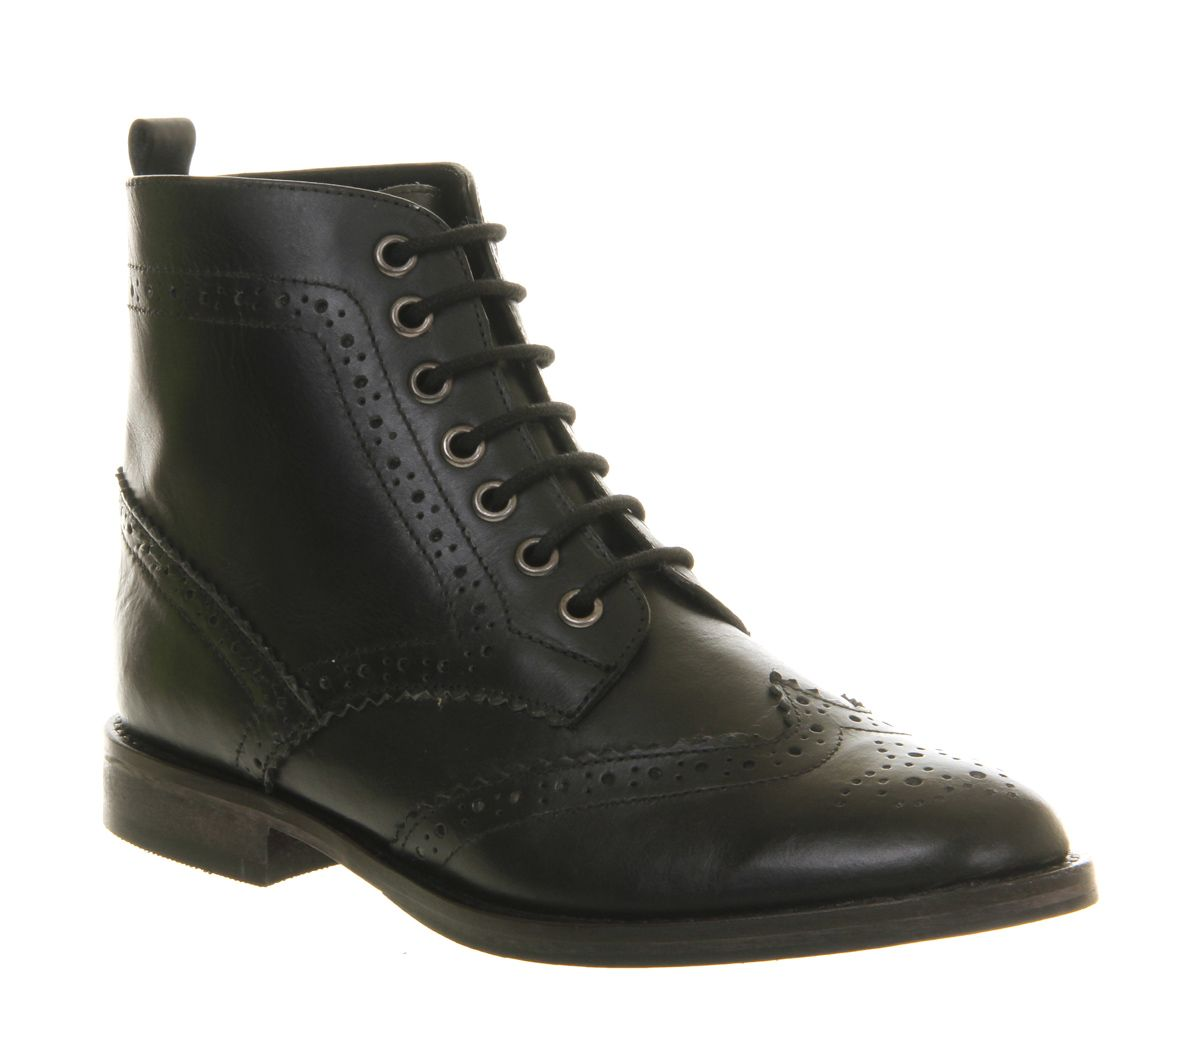 Office Breakin Brogue Black Leather - Brogues